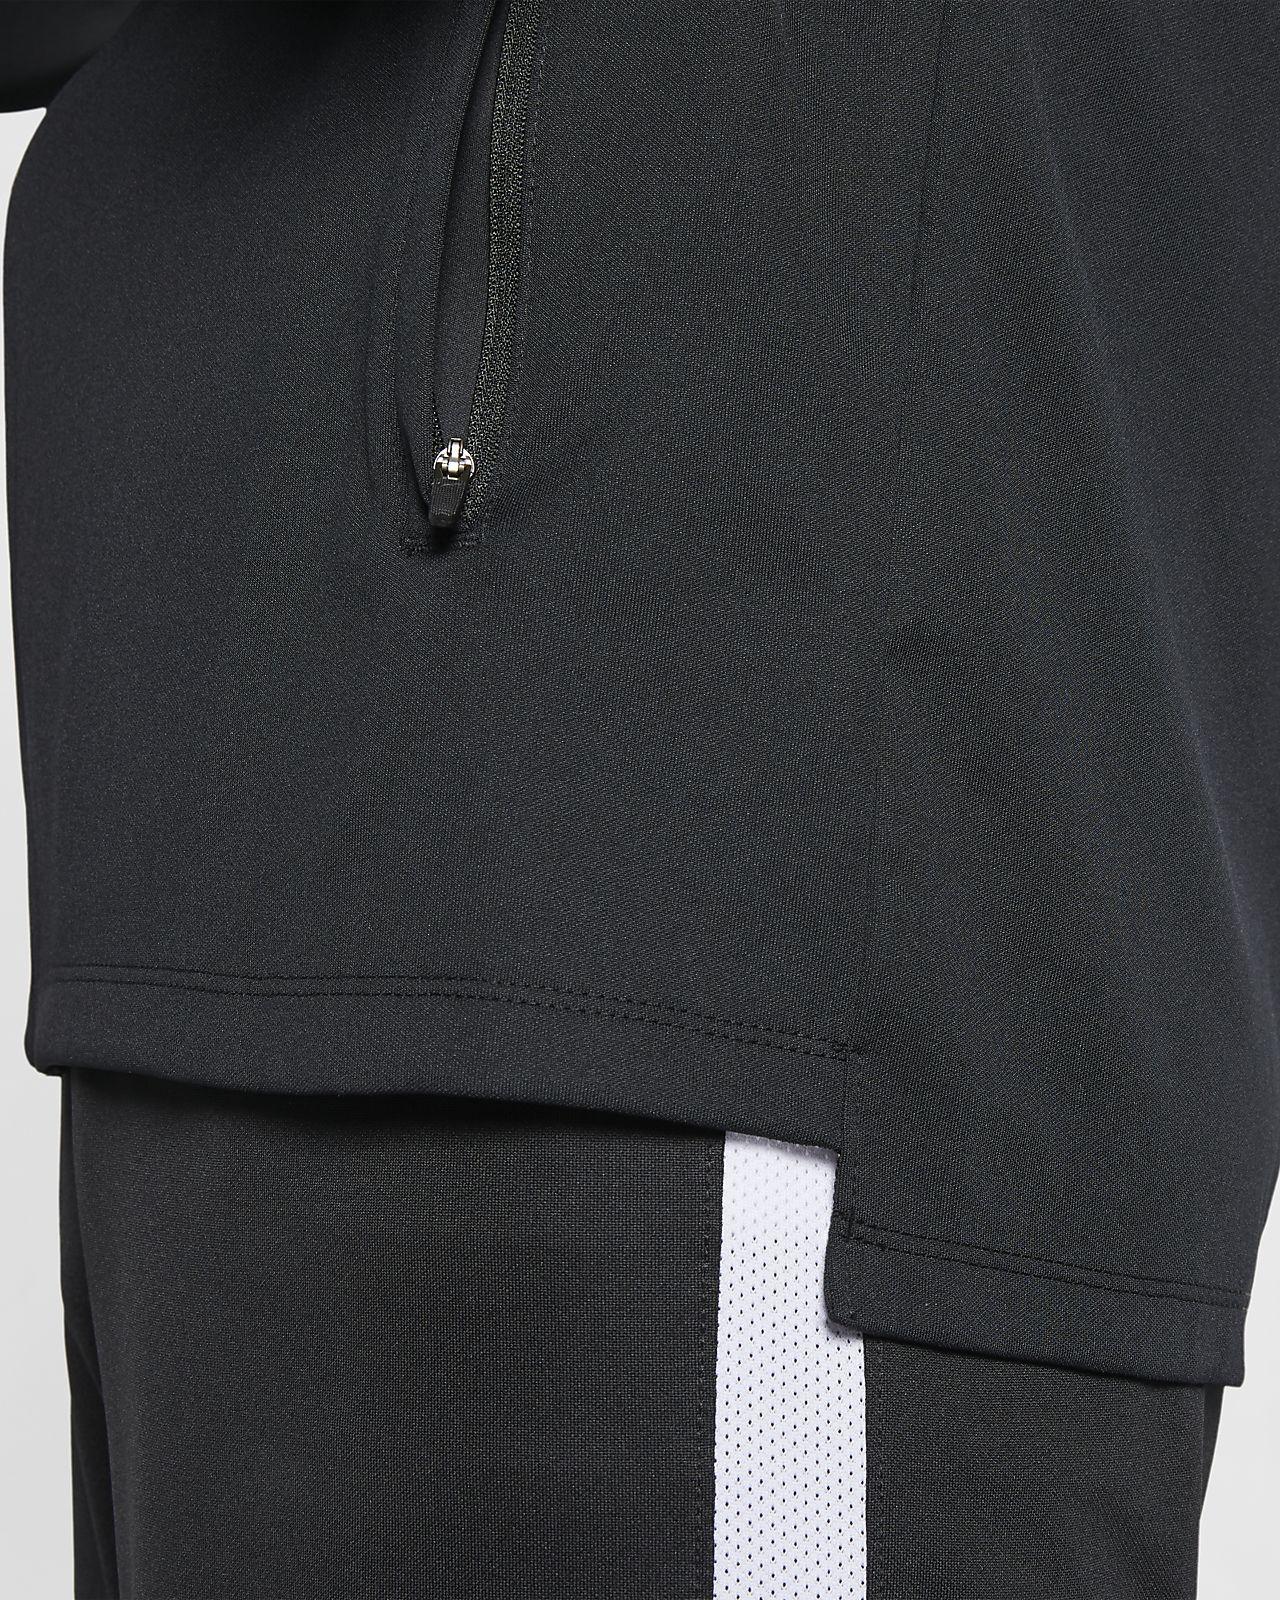 9253ea149155 Nike Dri-FIT Squad Men s Full-Zip Football Jacket. Nike.com ZA